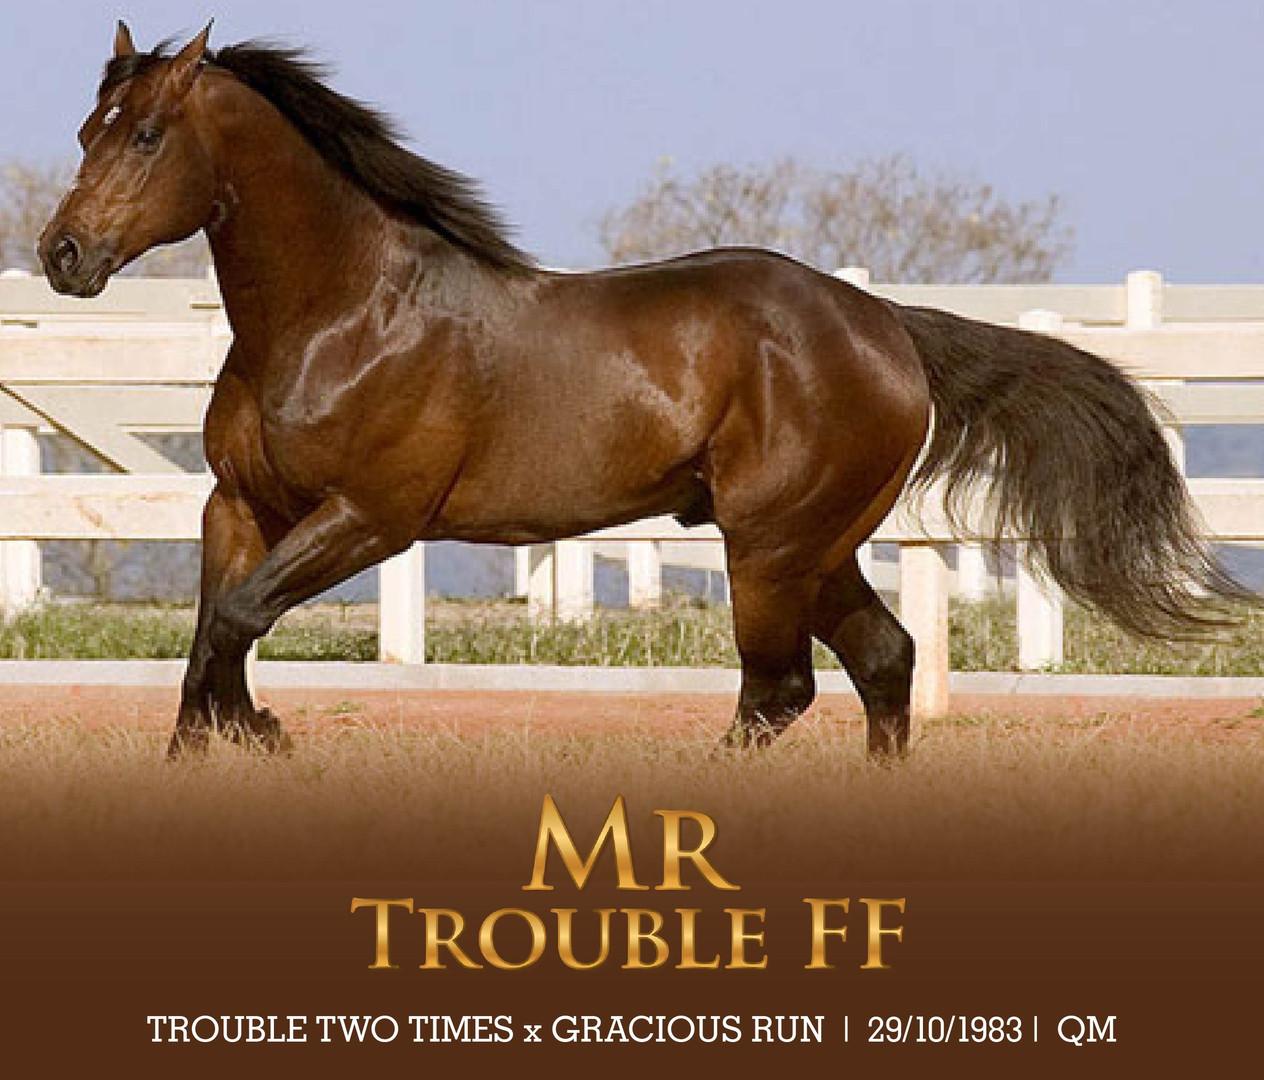 MR TROUBLE FF